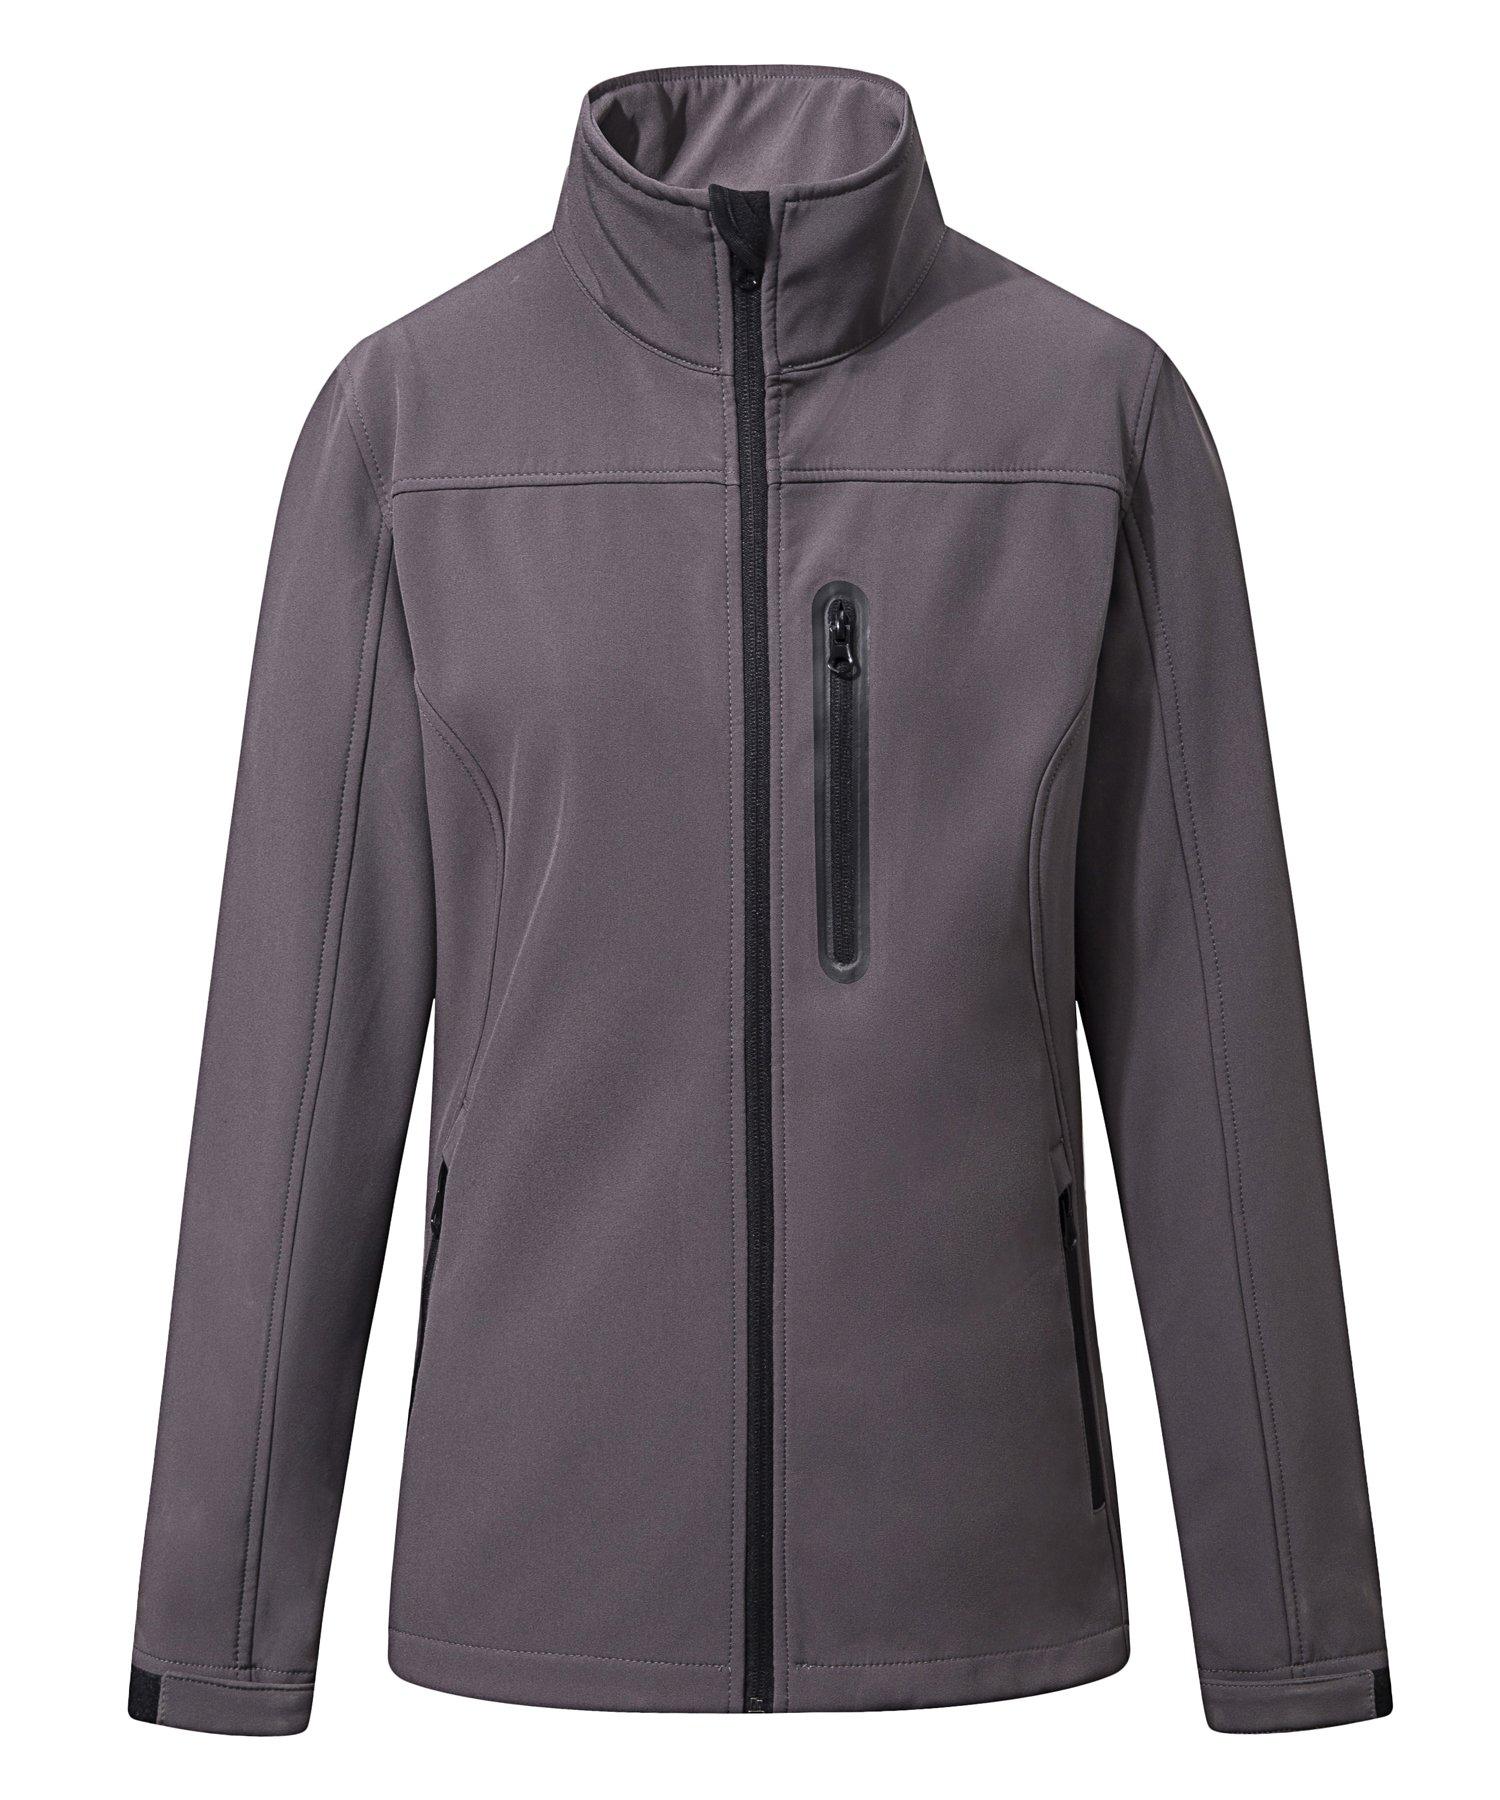 SPECIALMAGIC Women's Waterproof Outdoor Running Biking Jacket Cycling Softshell Grey S